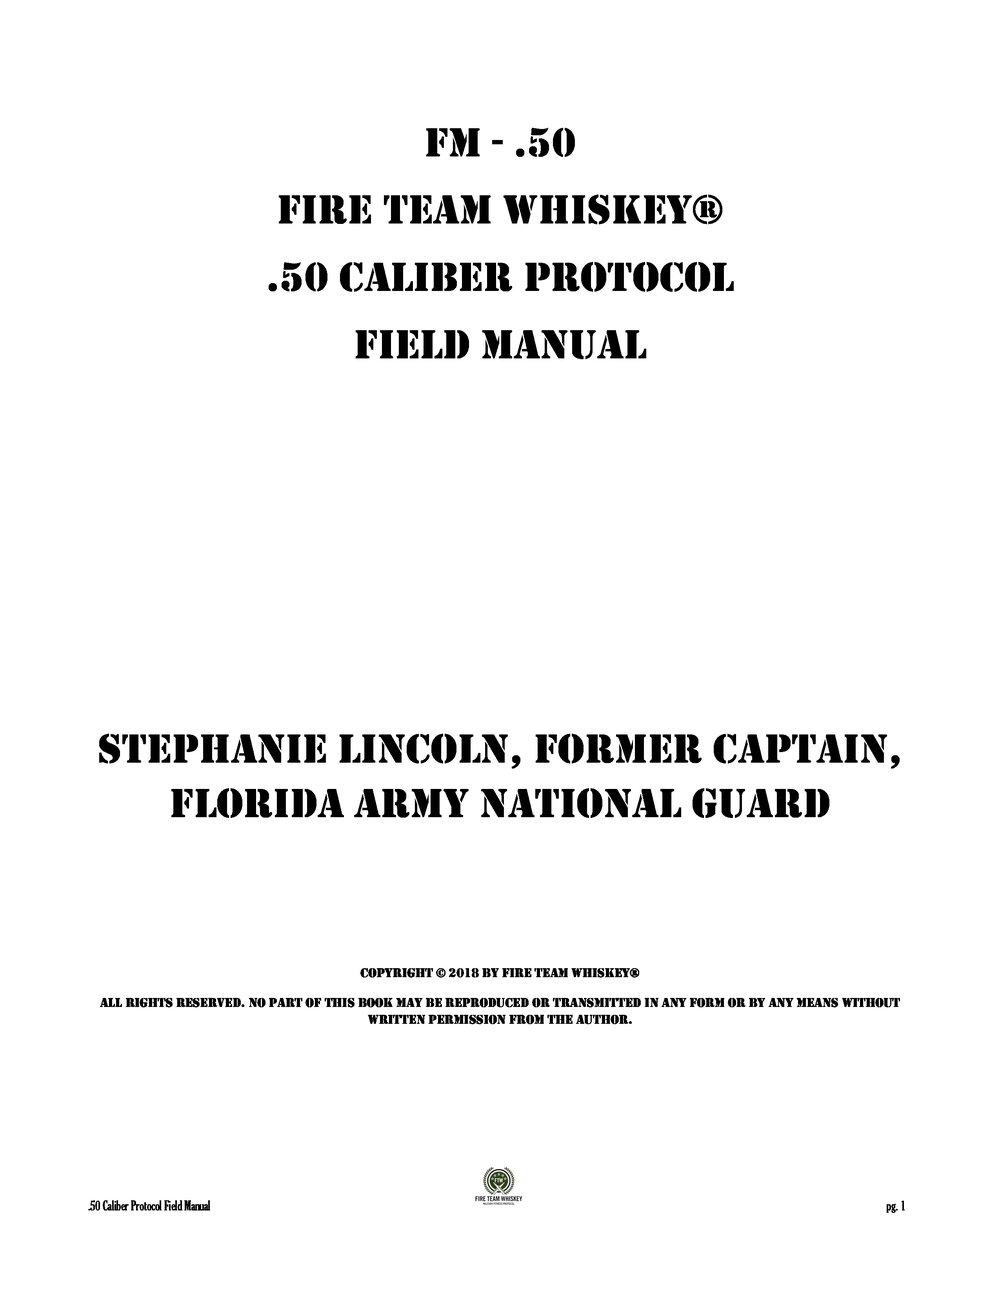 FM - 50-page-0.jpg